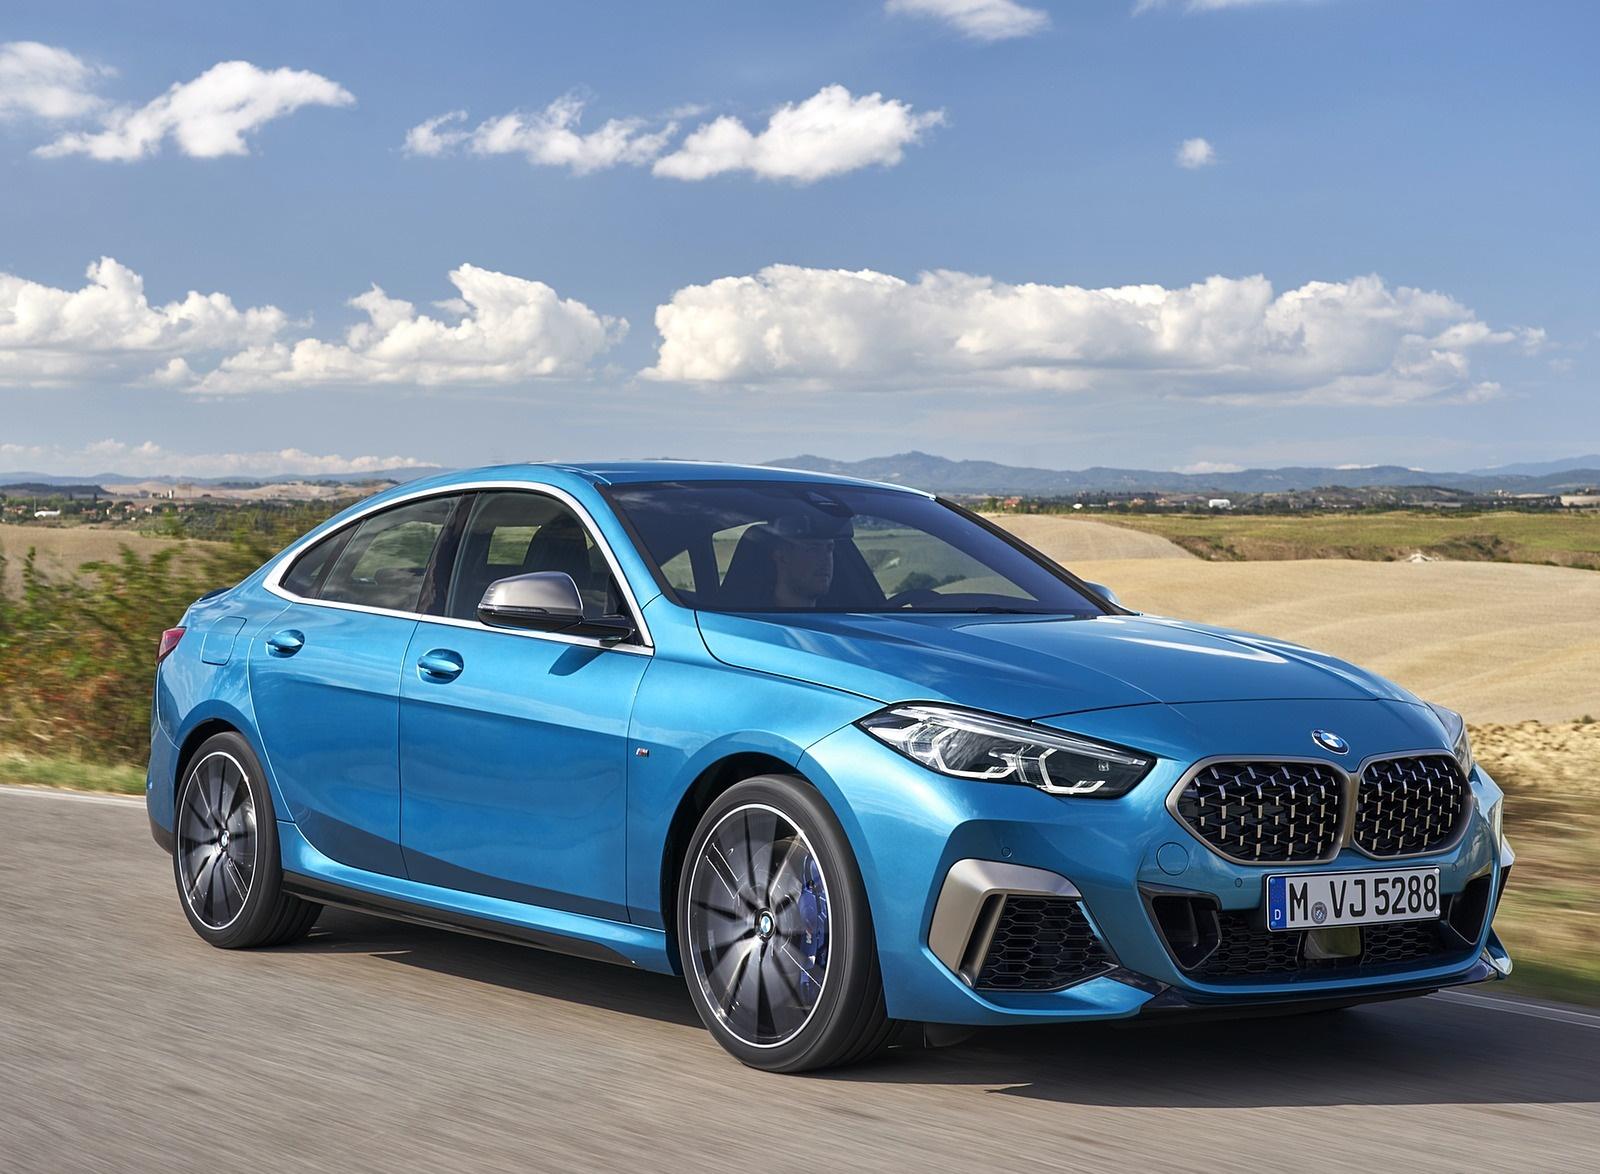 2020 BMW M235i Gran Coupe xDrive (Color: Snapper Rocks Blue Metallic) Front Three-Quarter Wallpapers (12)